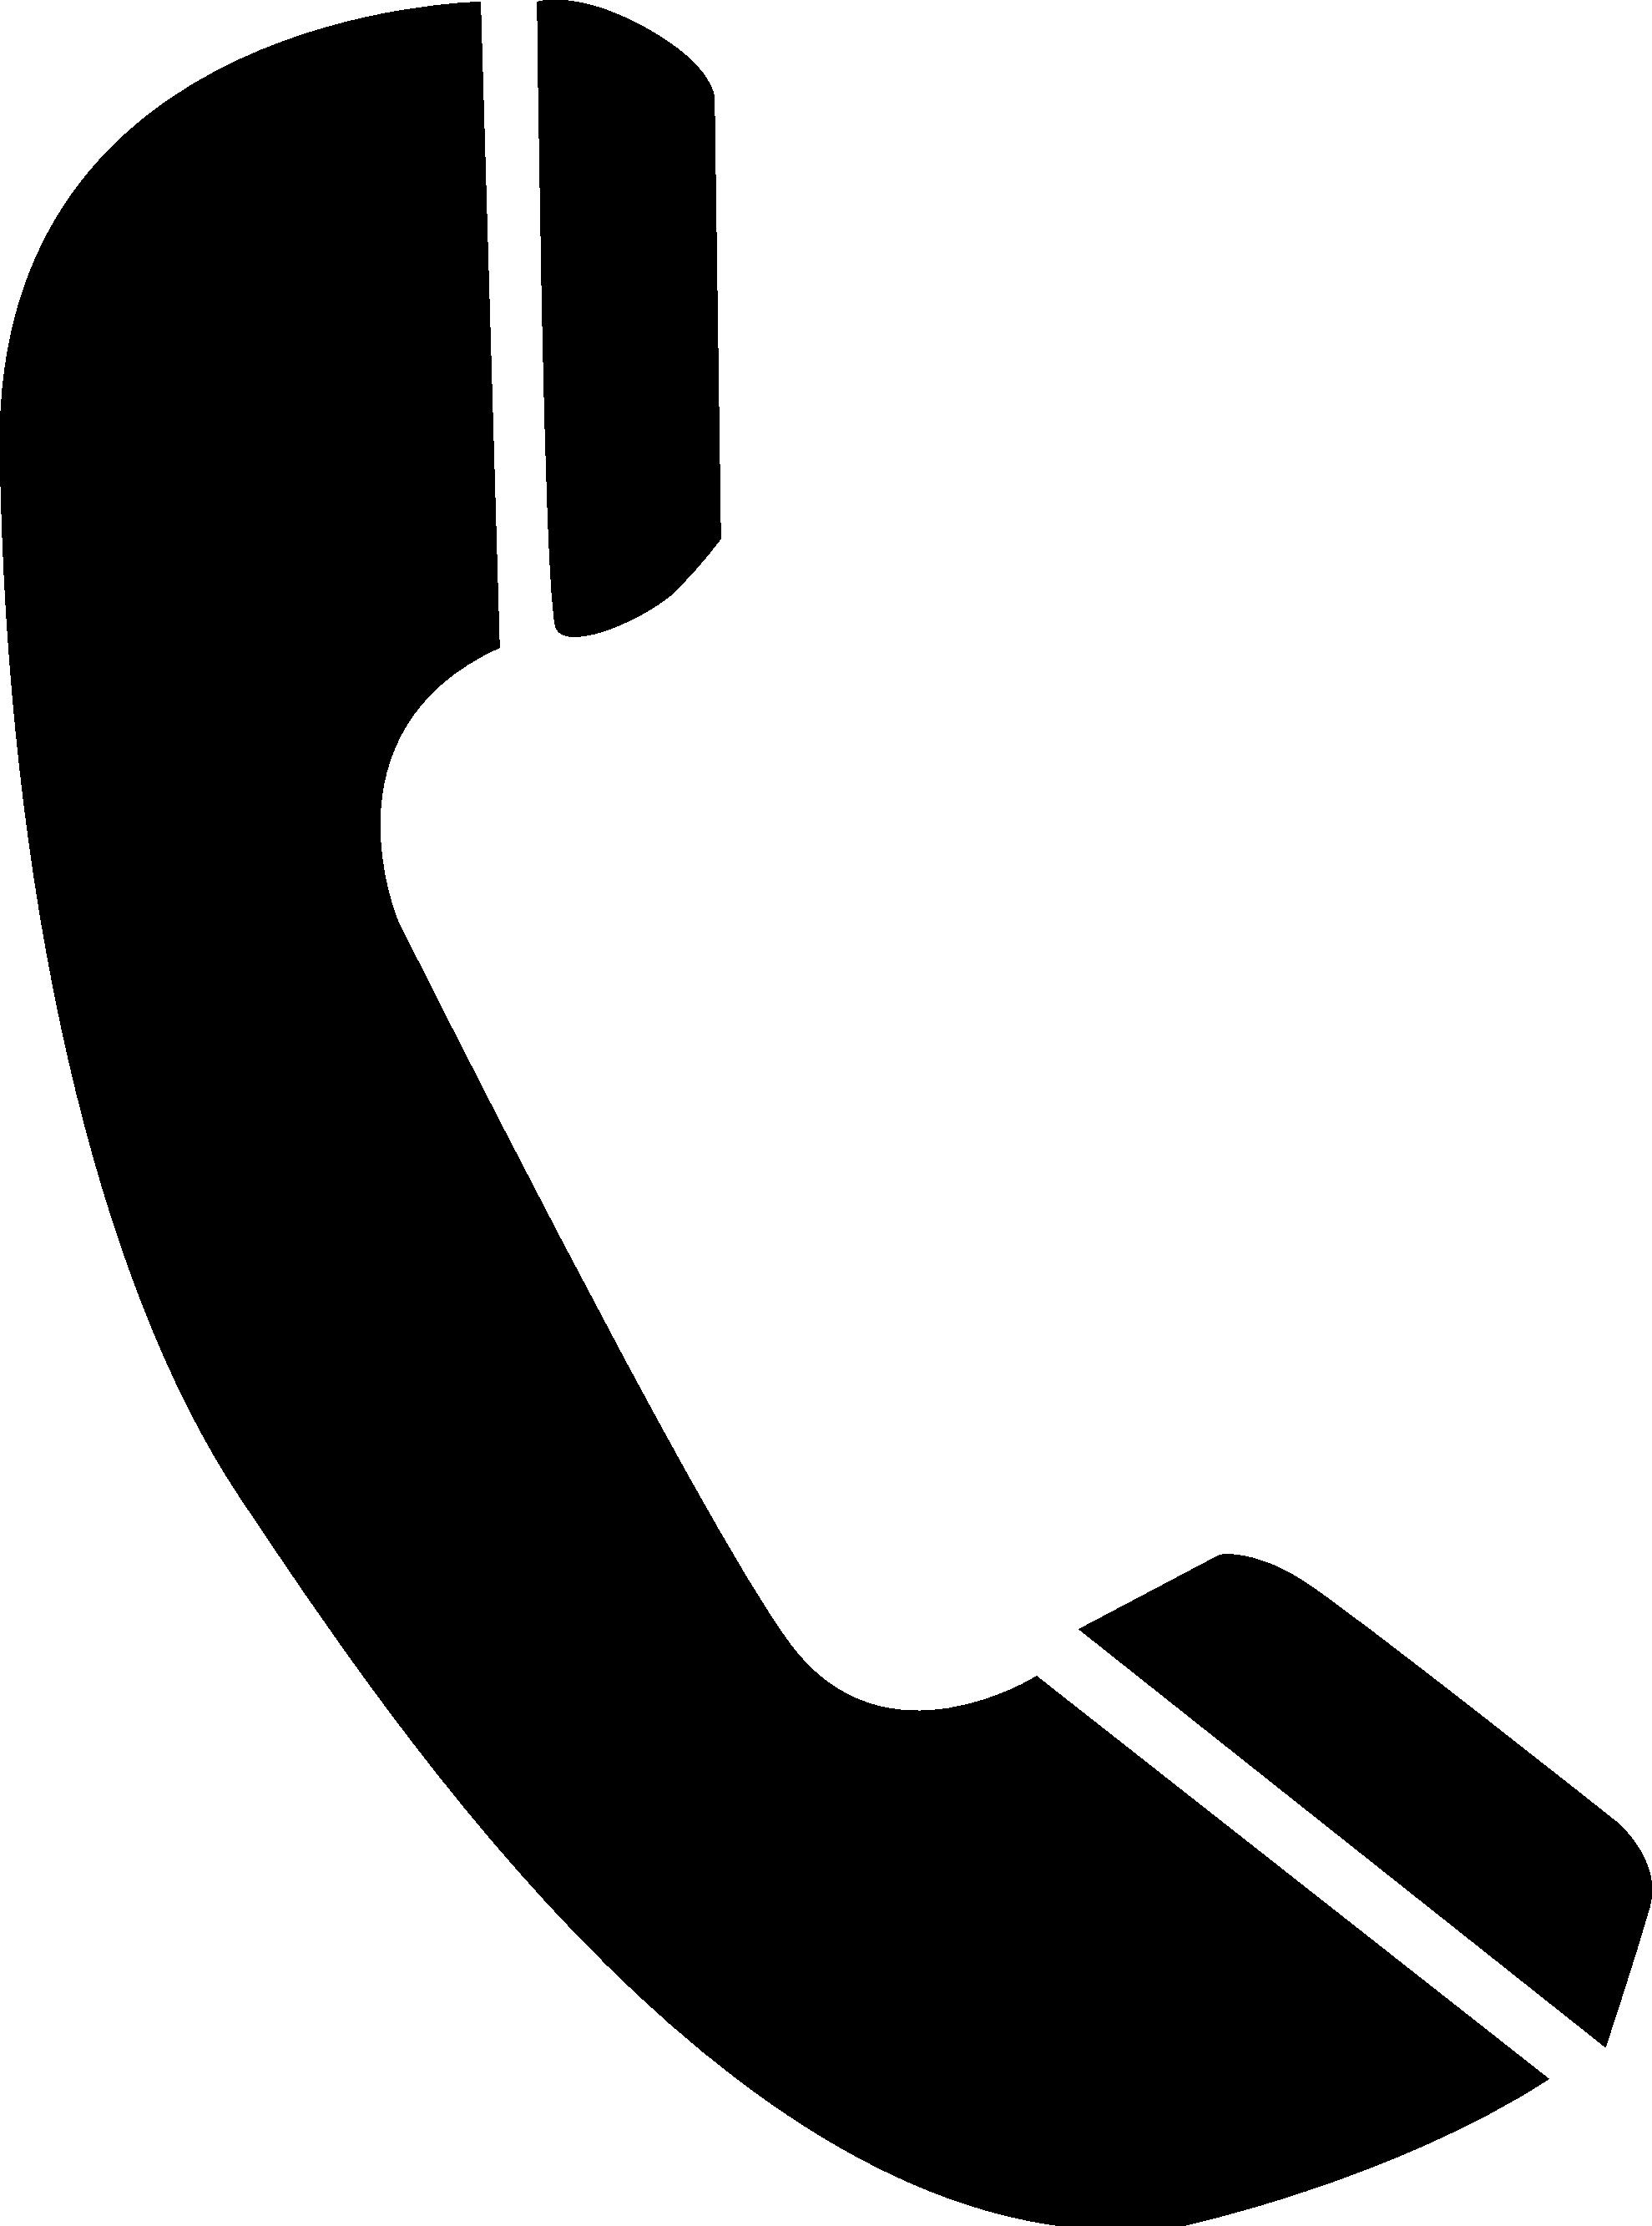 Website clipart vector. Phone icon panda free